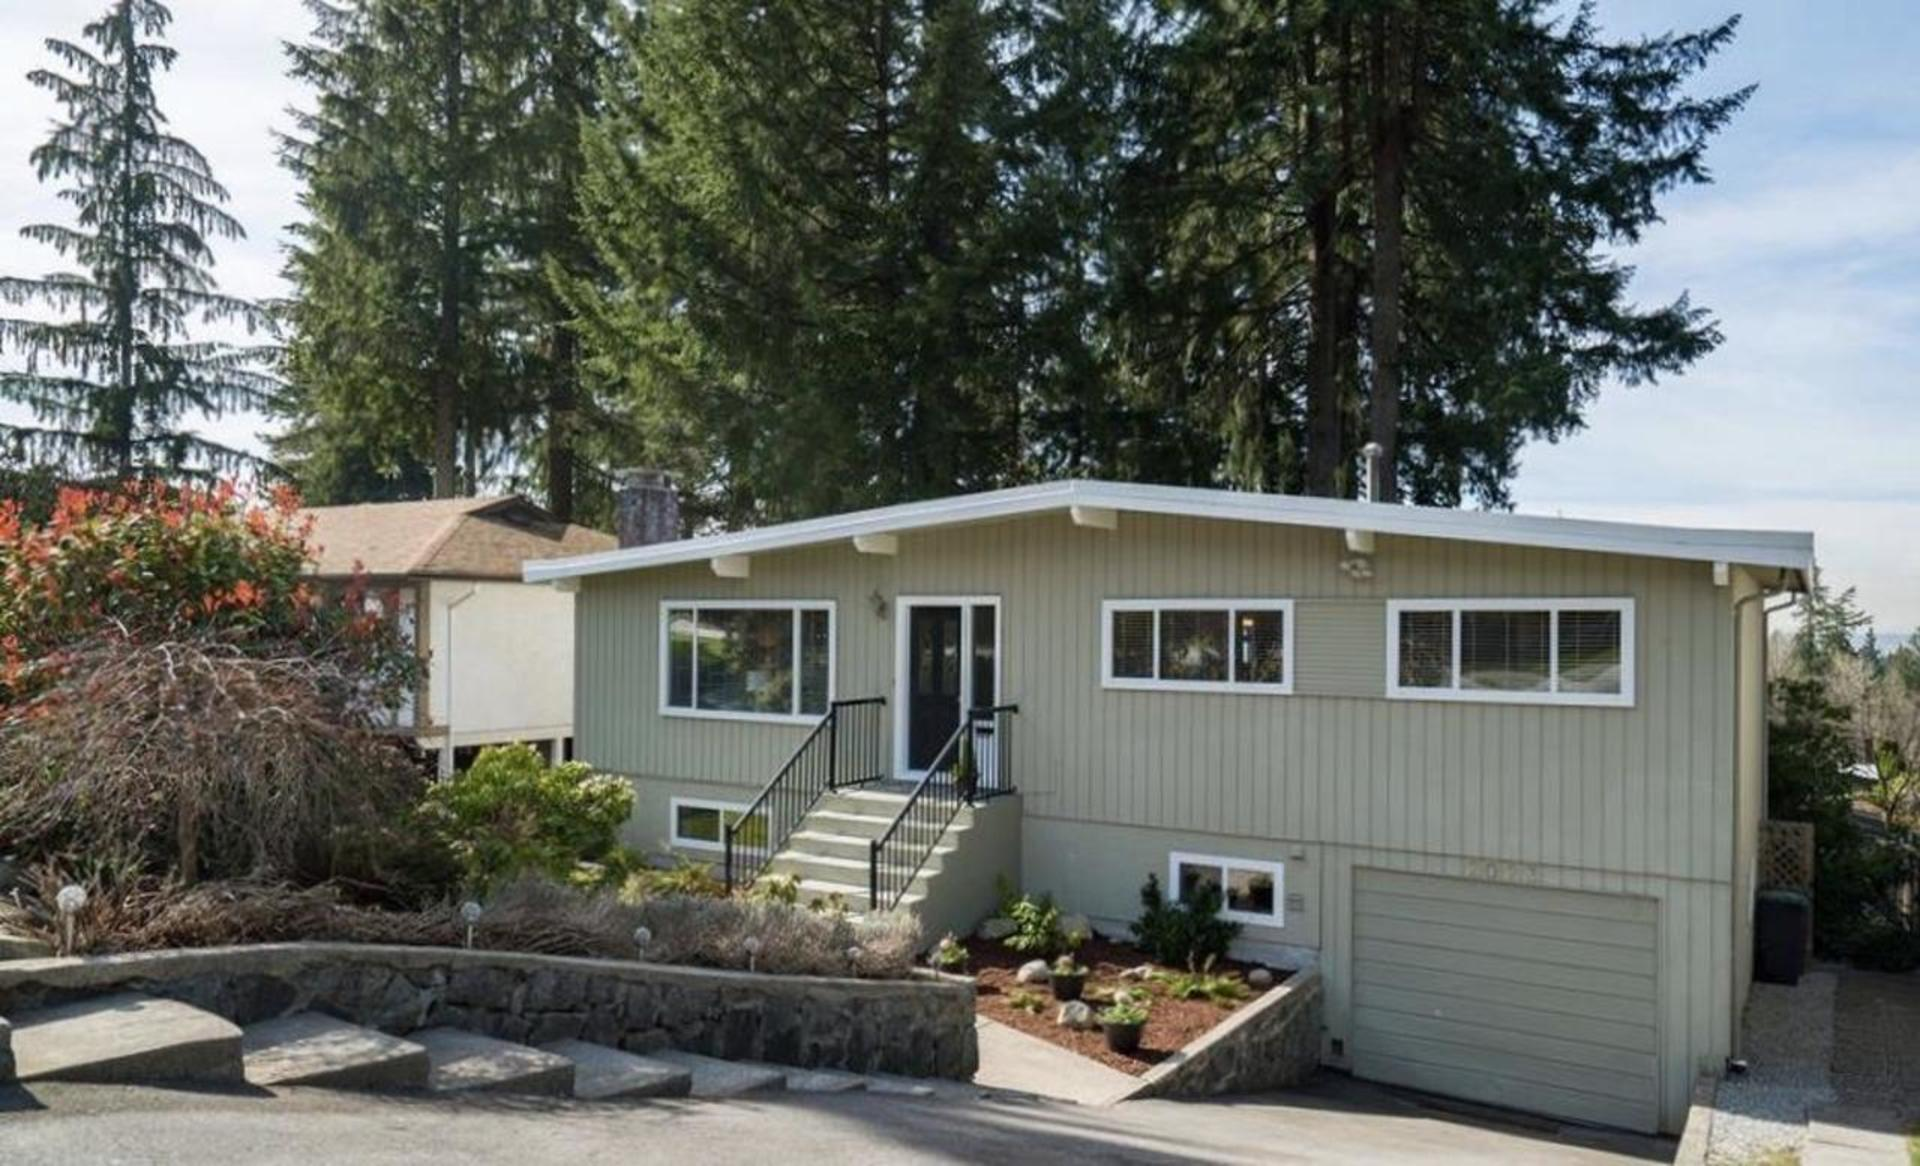 2023 Hyannis Drive, Blueridge NV, North Vancouver